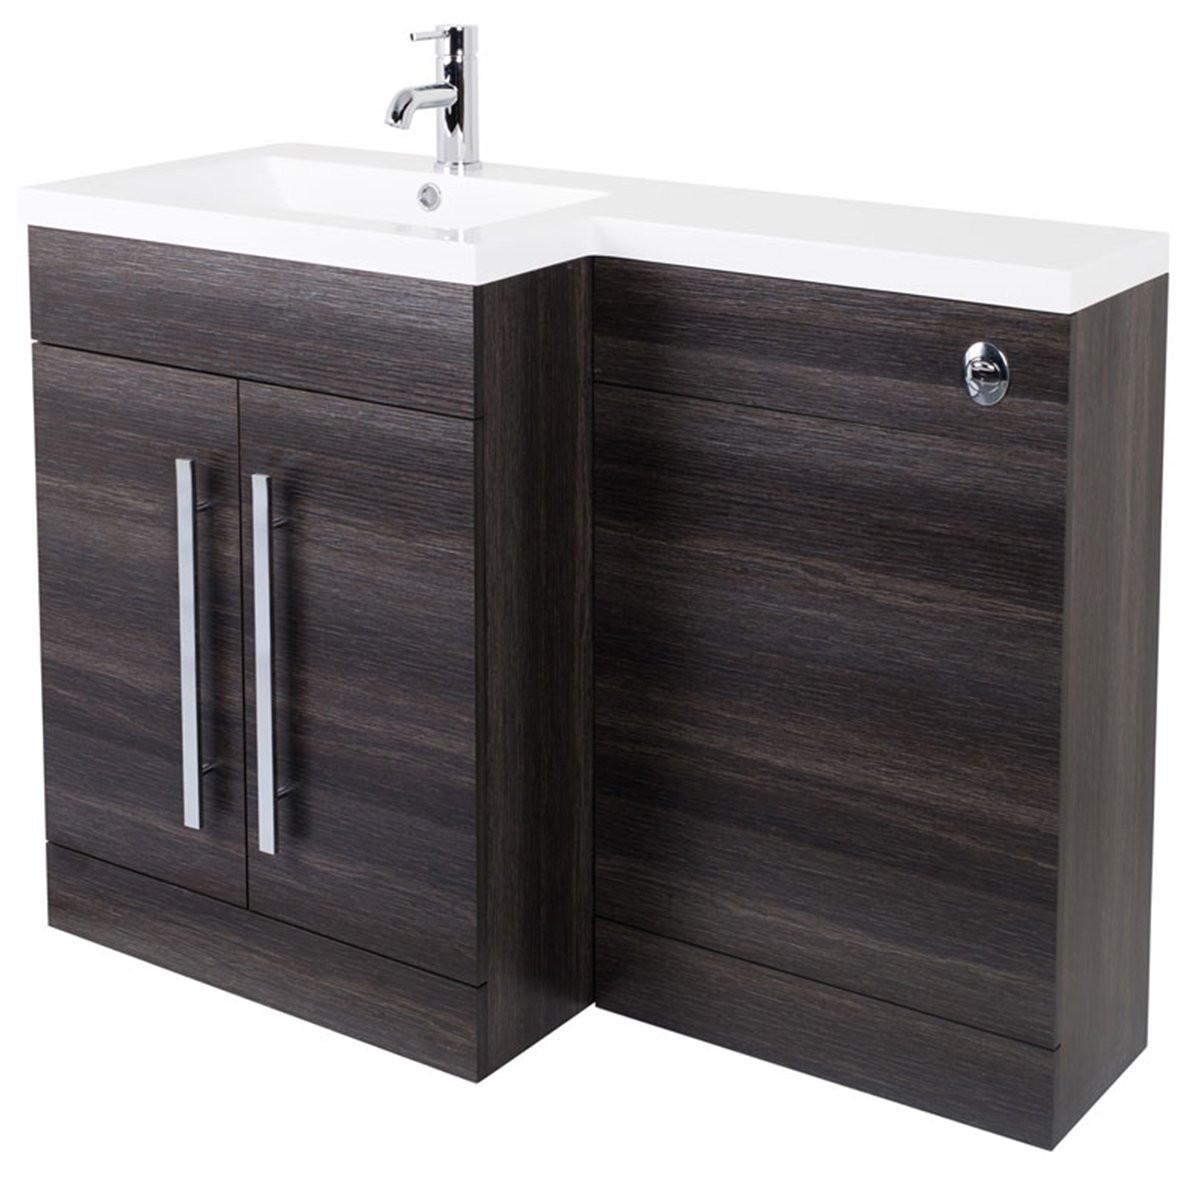 Bathroom Basin Vanity Unit Toilet Combined Furniture Tall ...